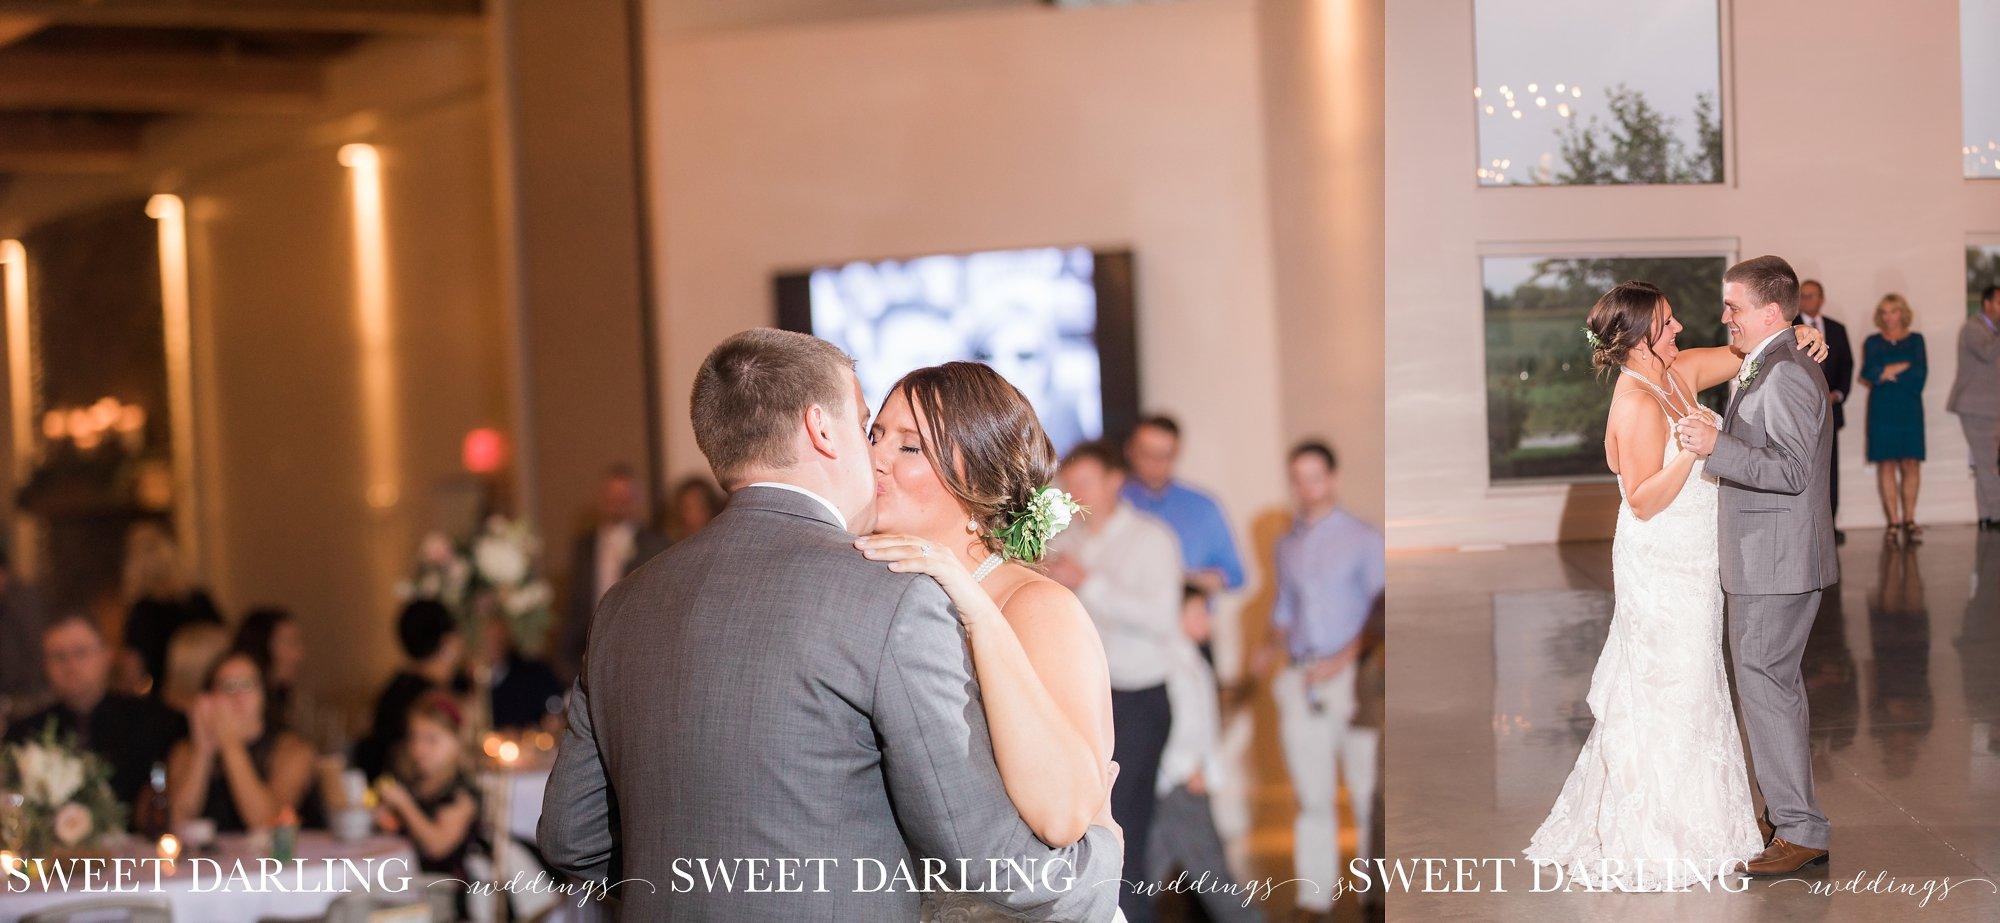 Wedding couple dance at central Illinois wedding reception